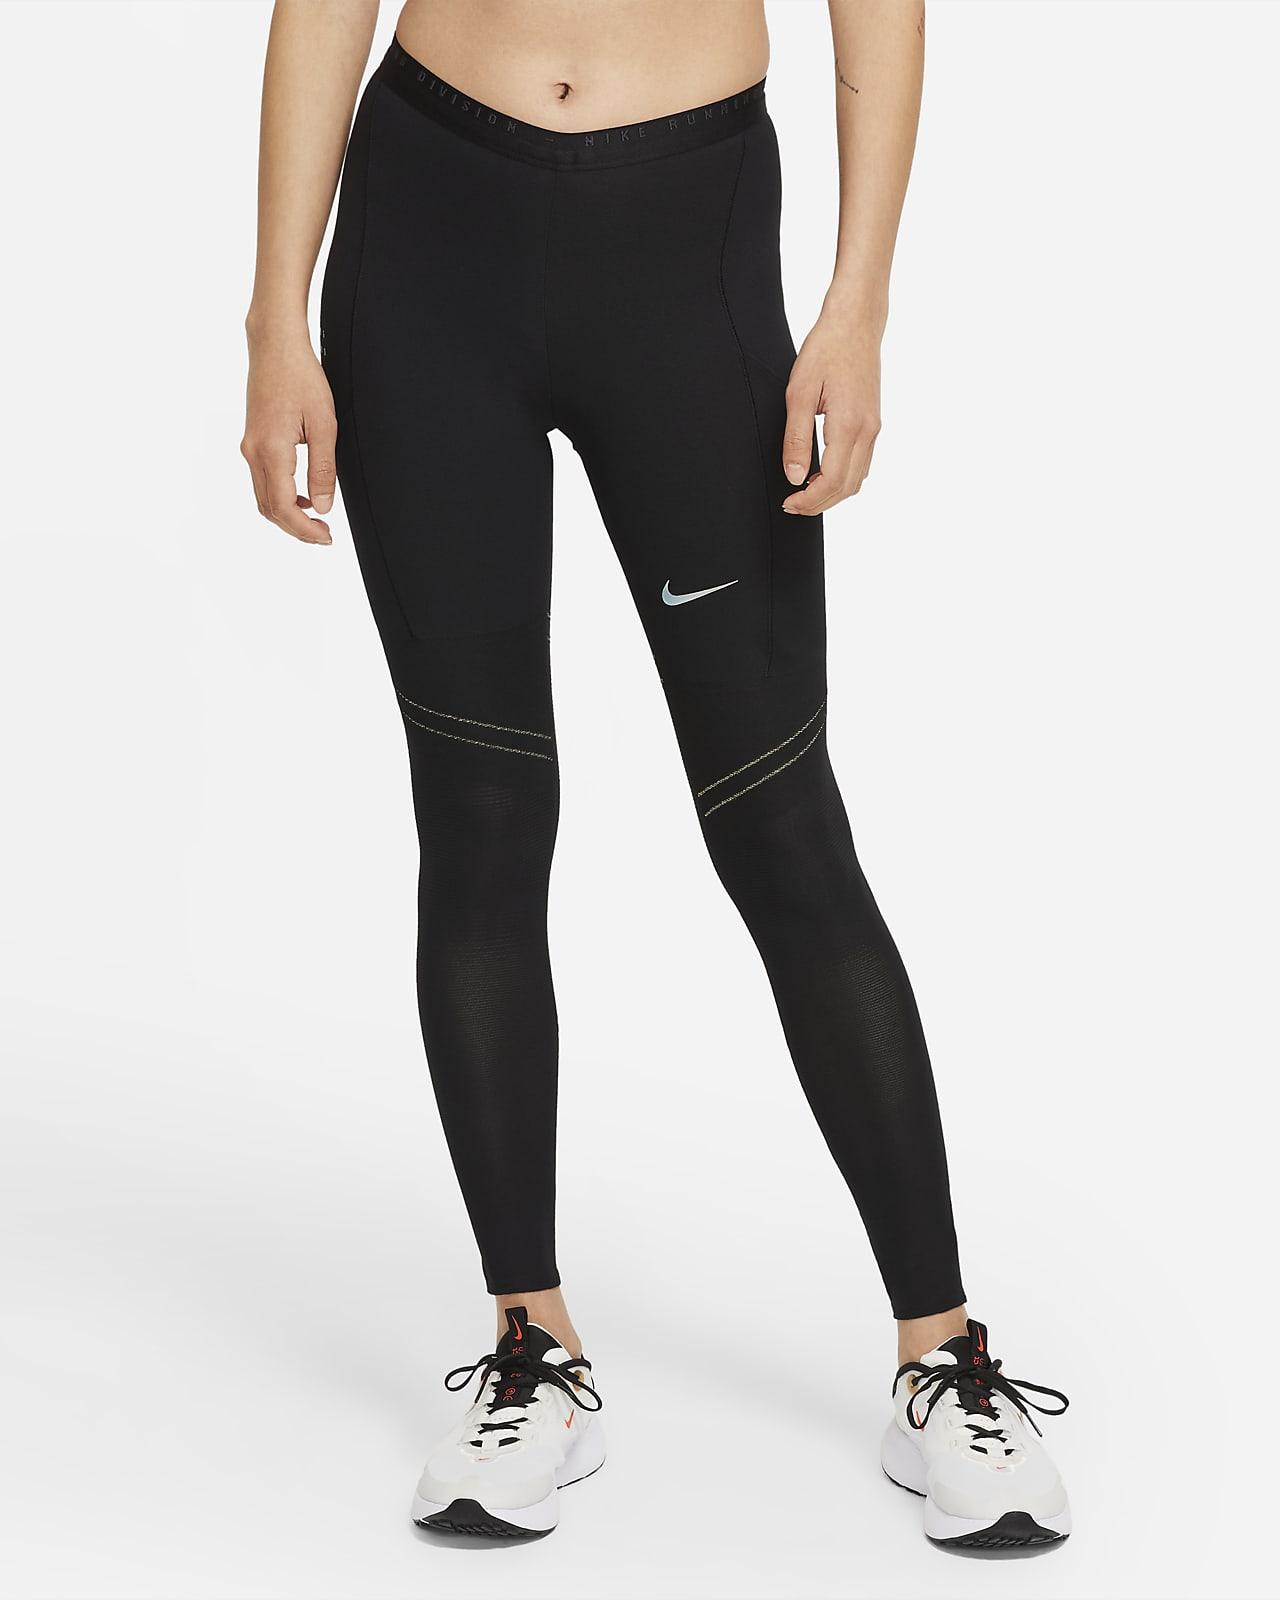 Nike Dri-FIT ADV Run Division Epic Luxe 女子中腰跑步紧身裤